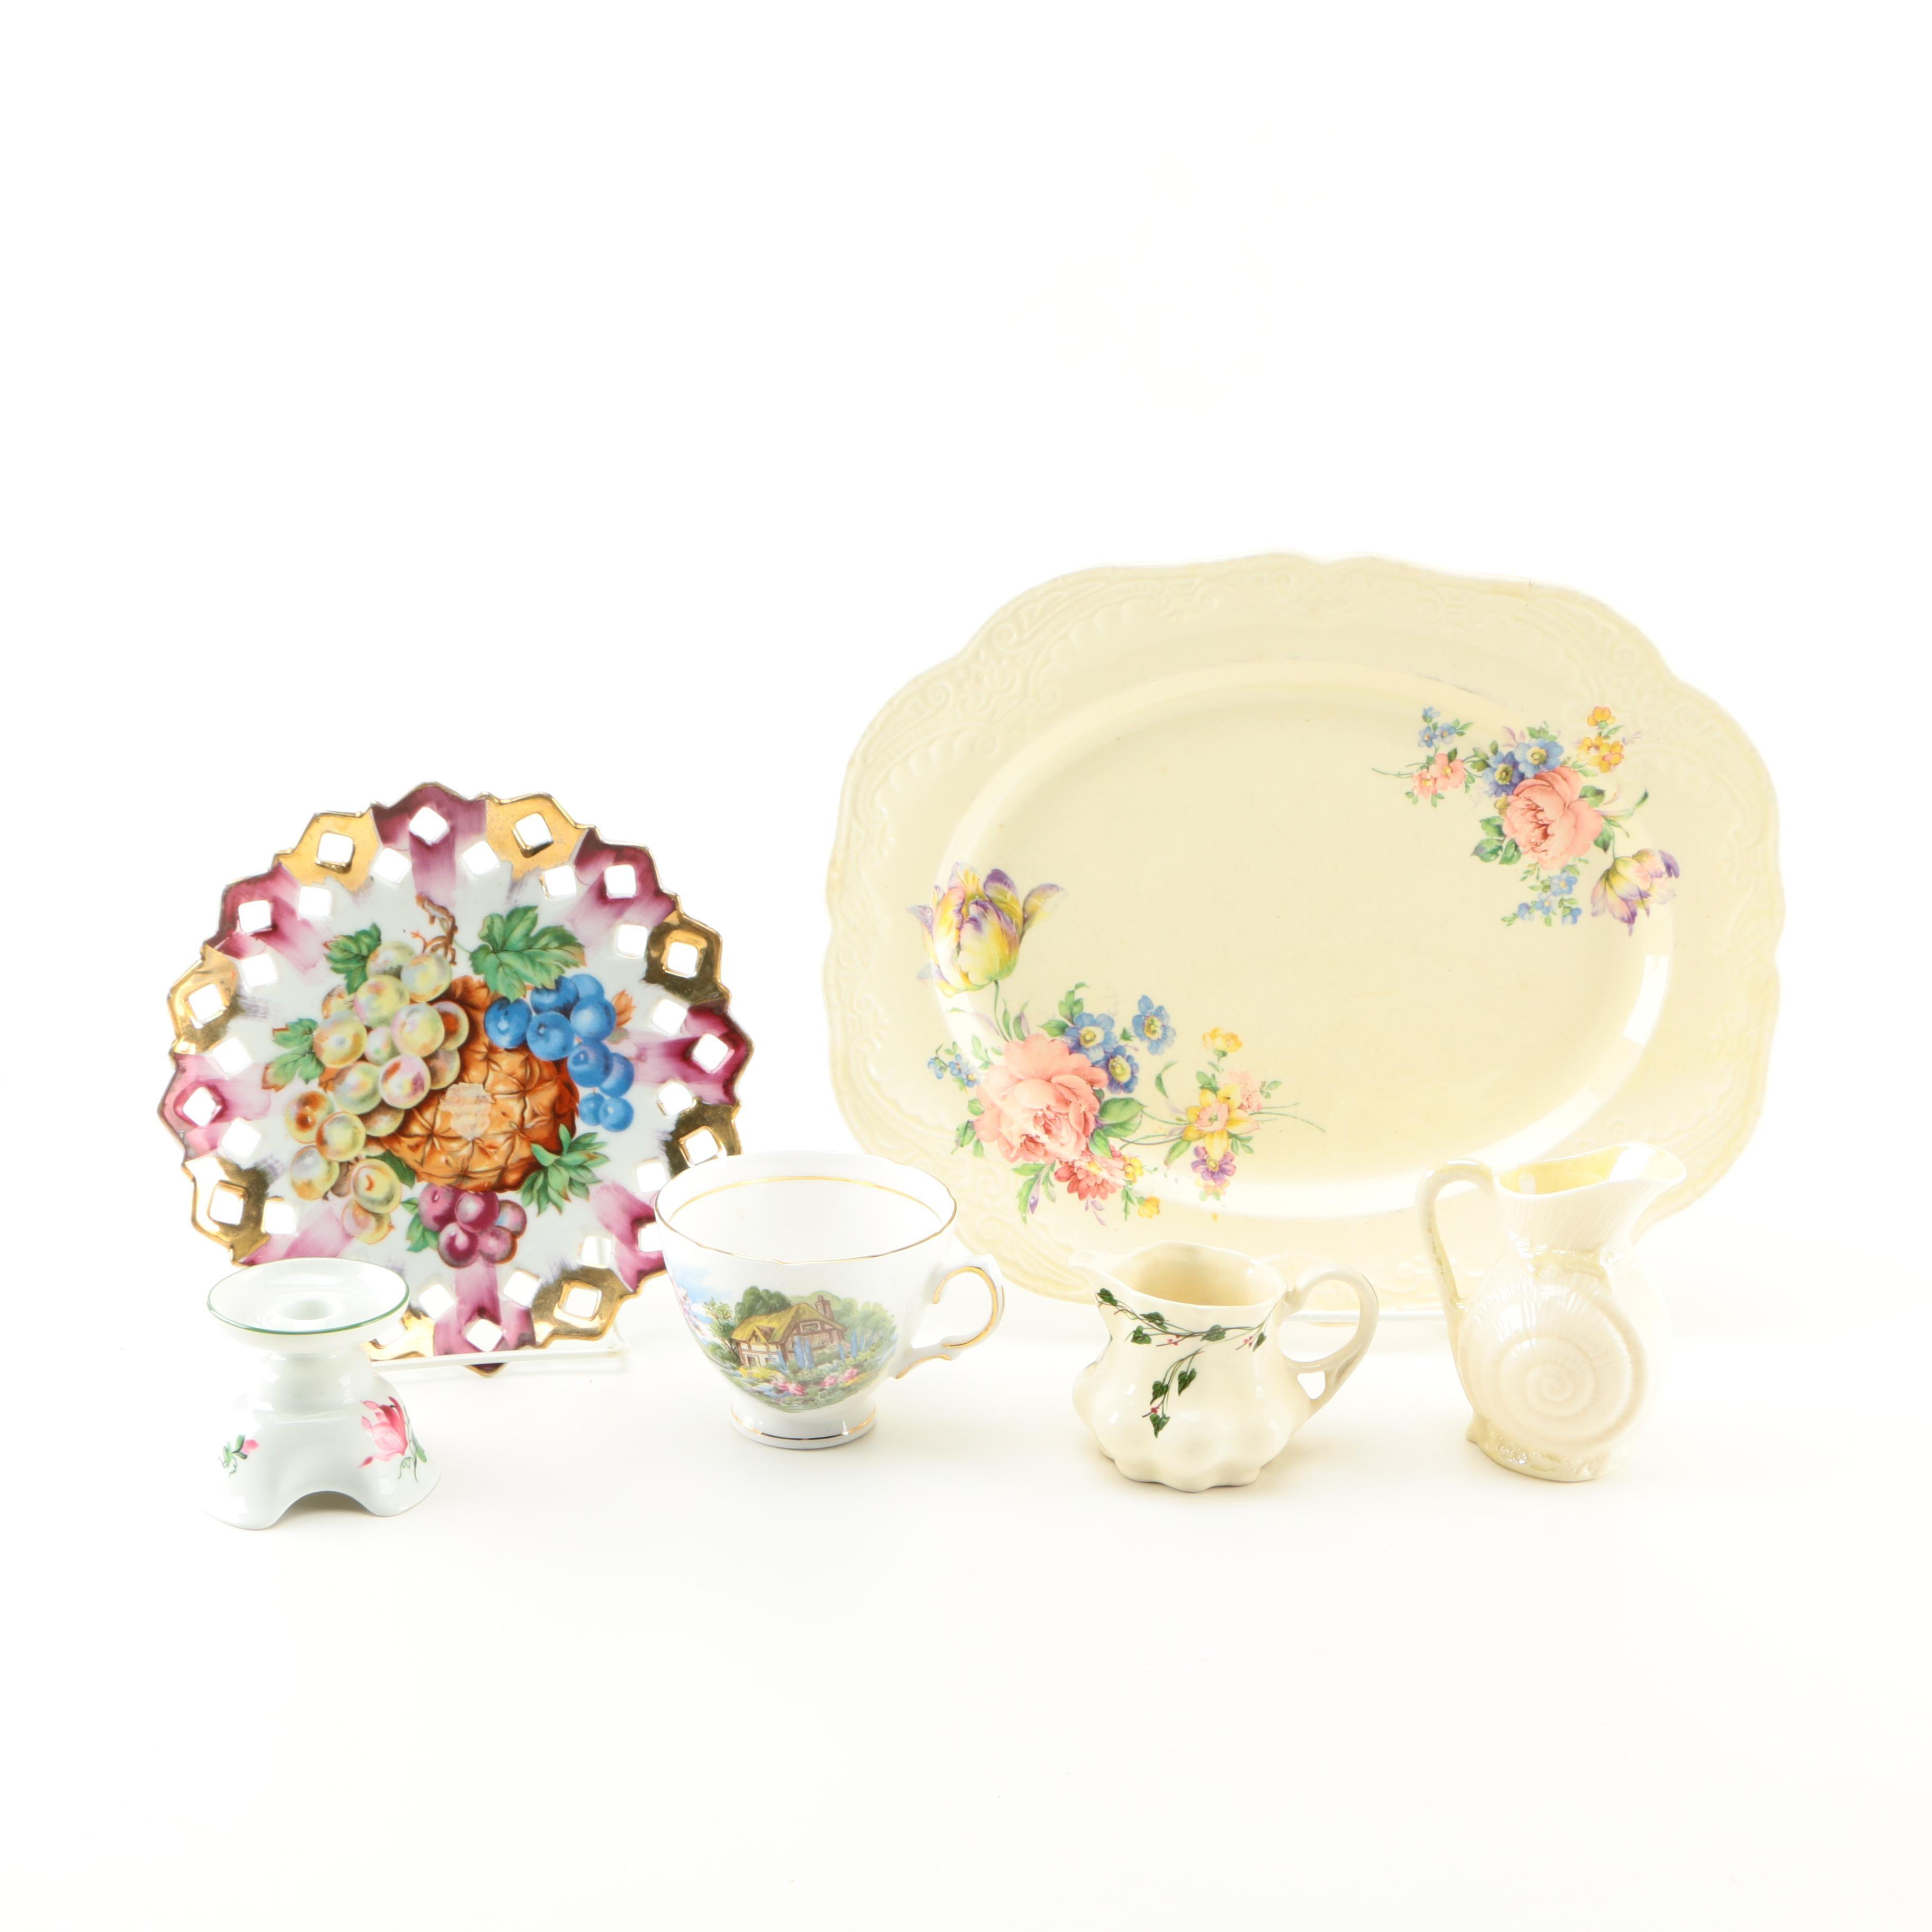 Hand-Painted Porcelain Assortment Including Belleek